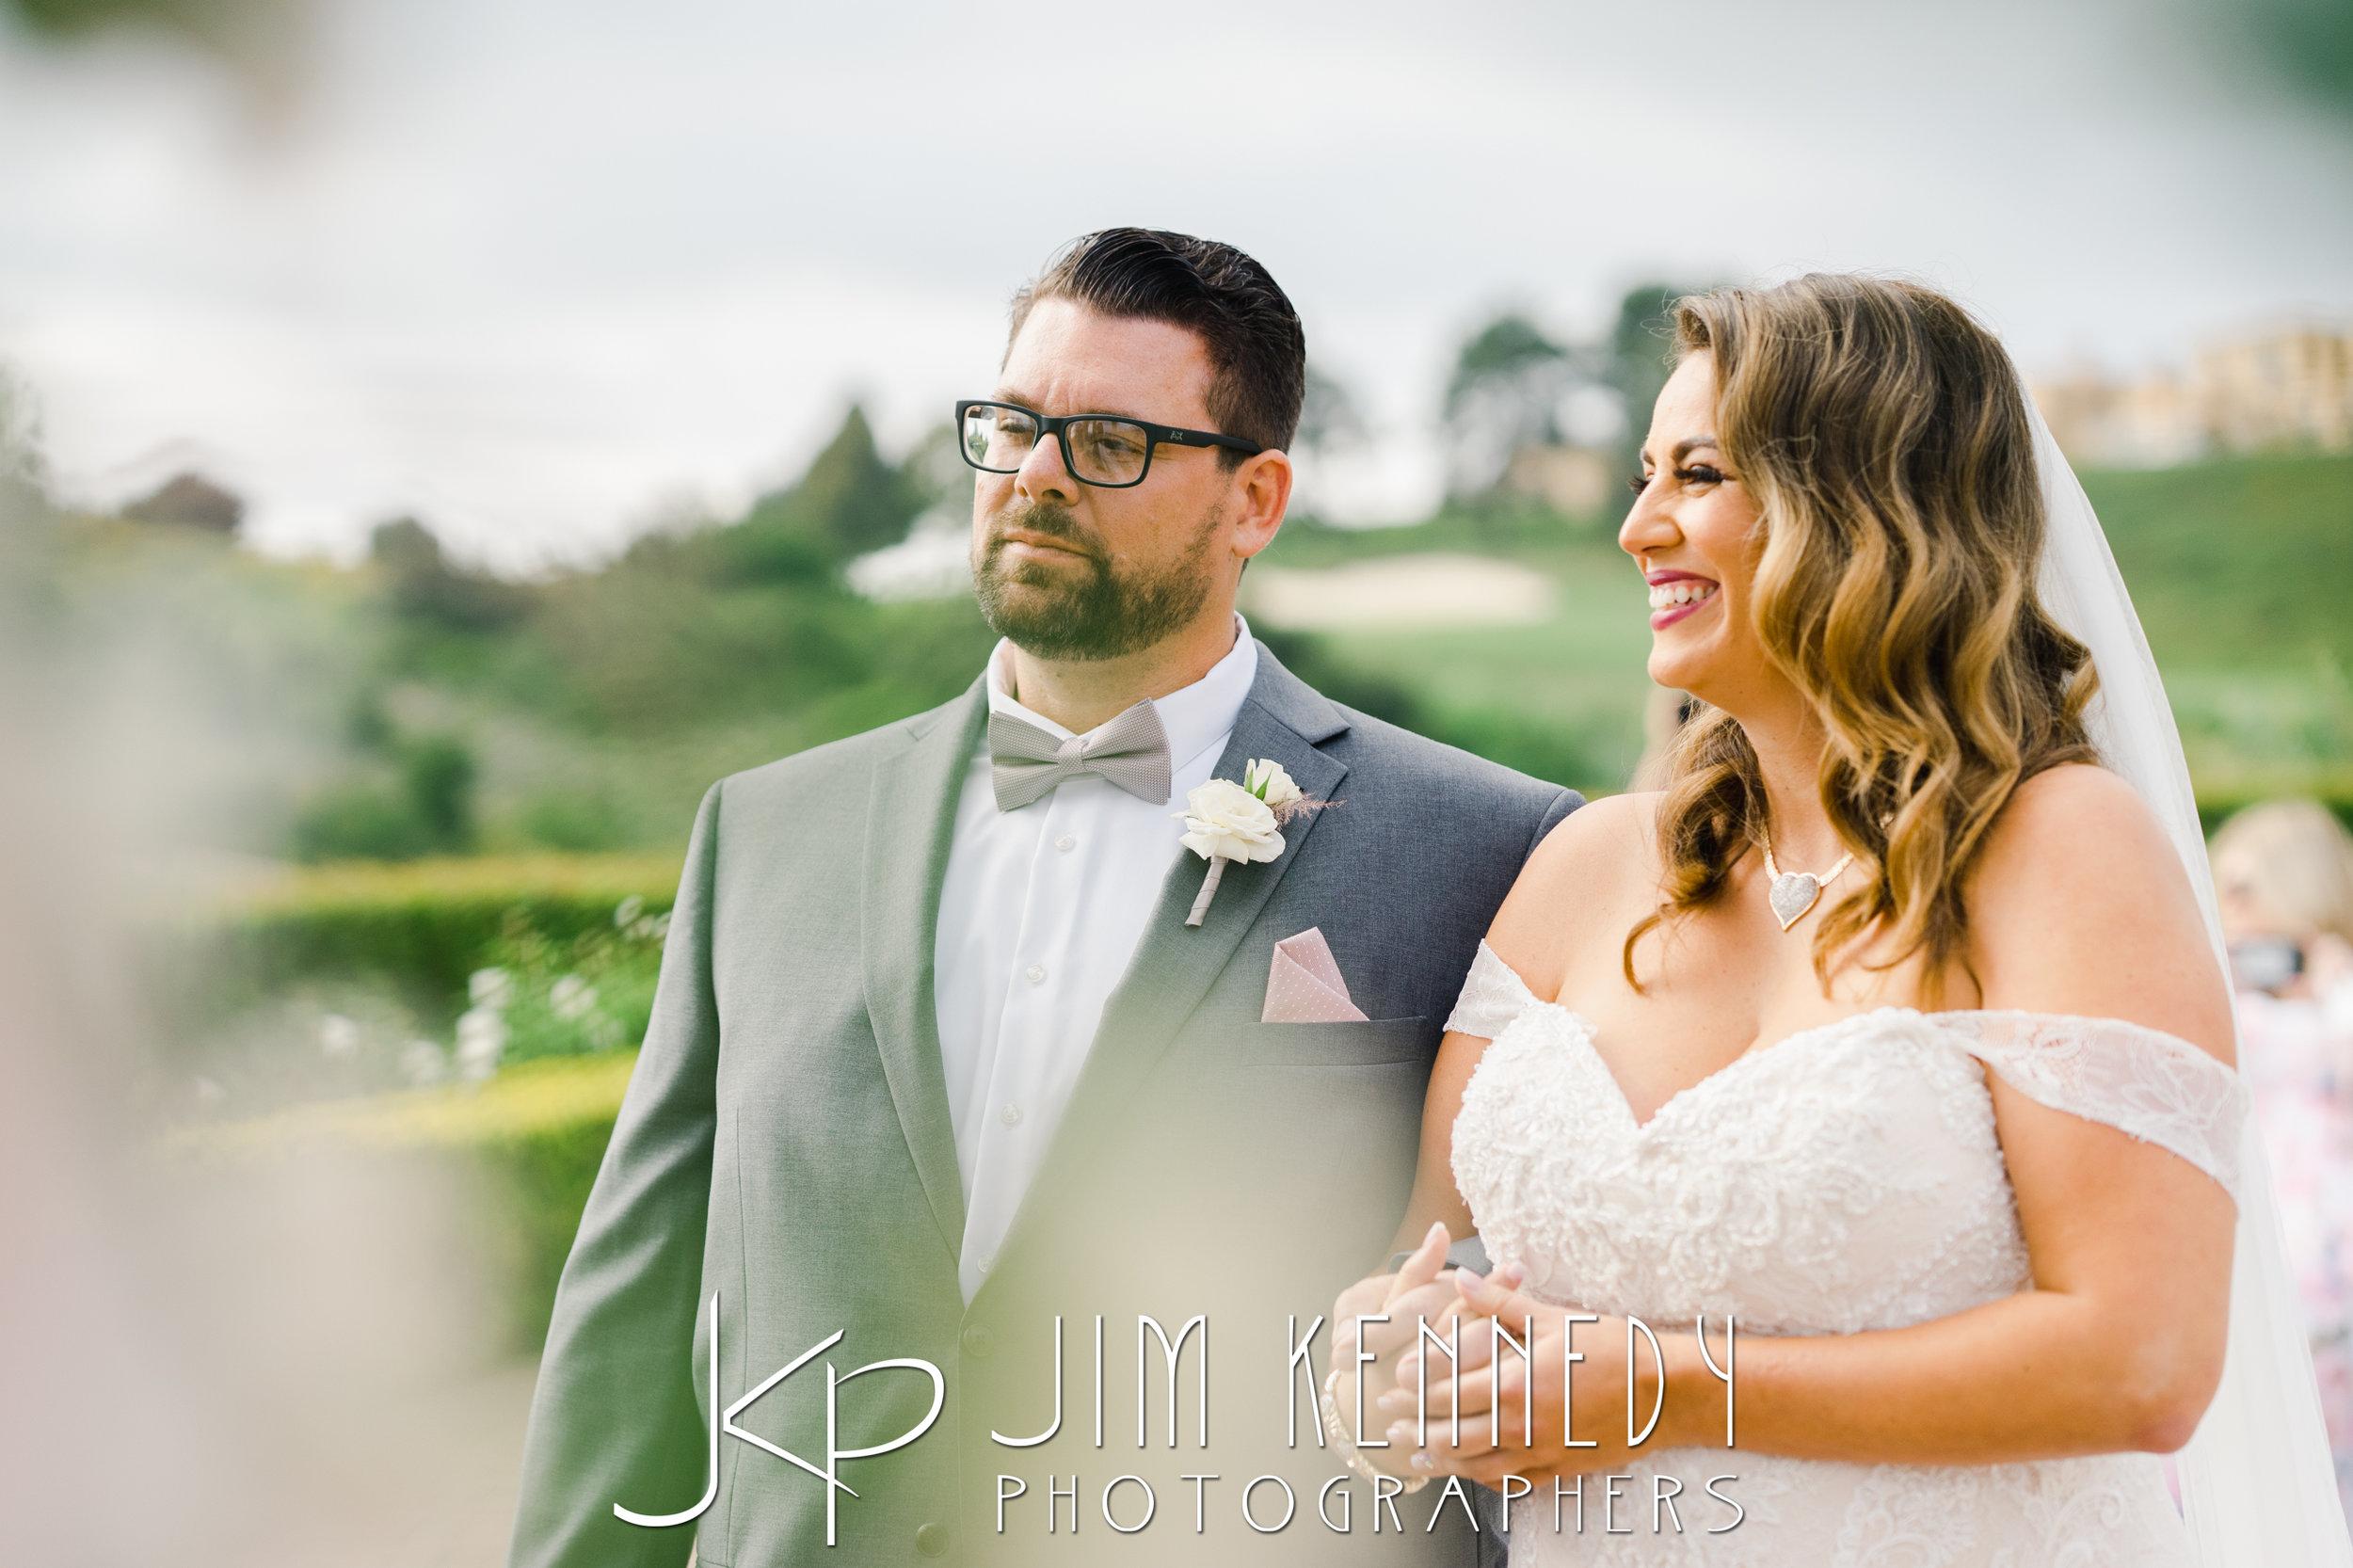 pelican-hill-wedding-jim-kenedy-photographers_0116.JPG